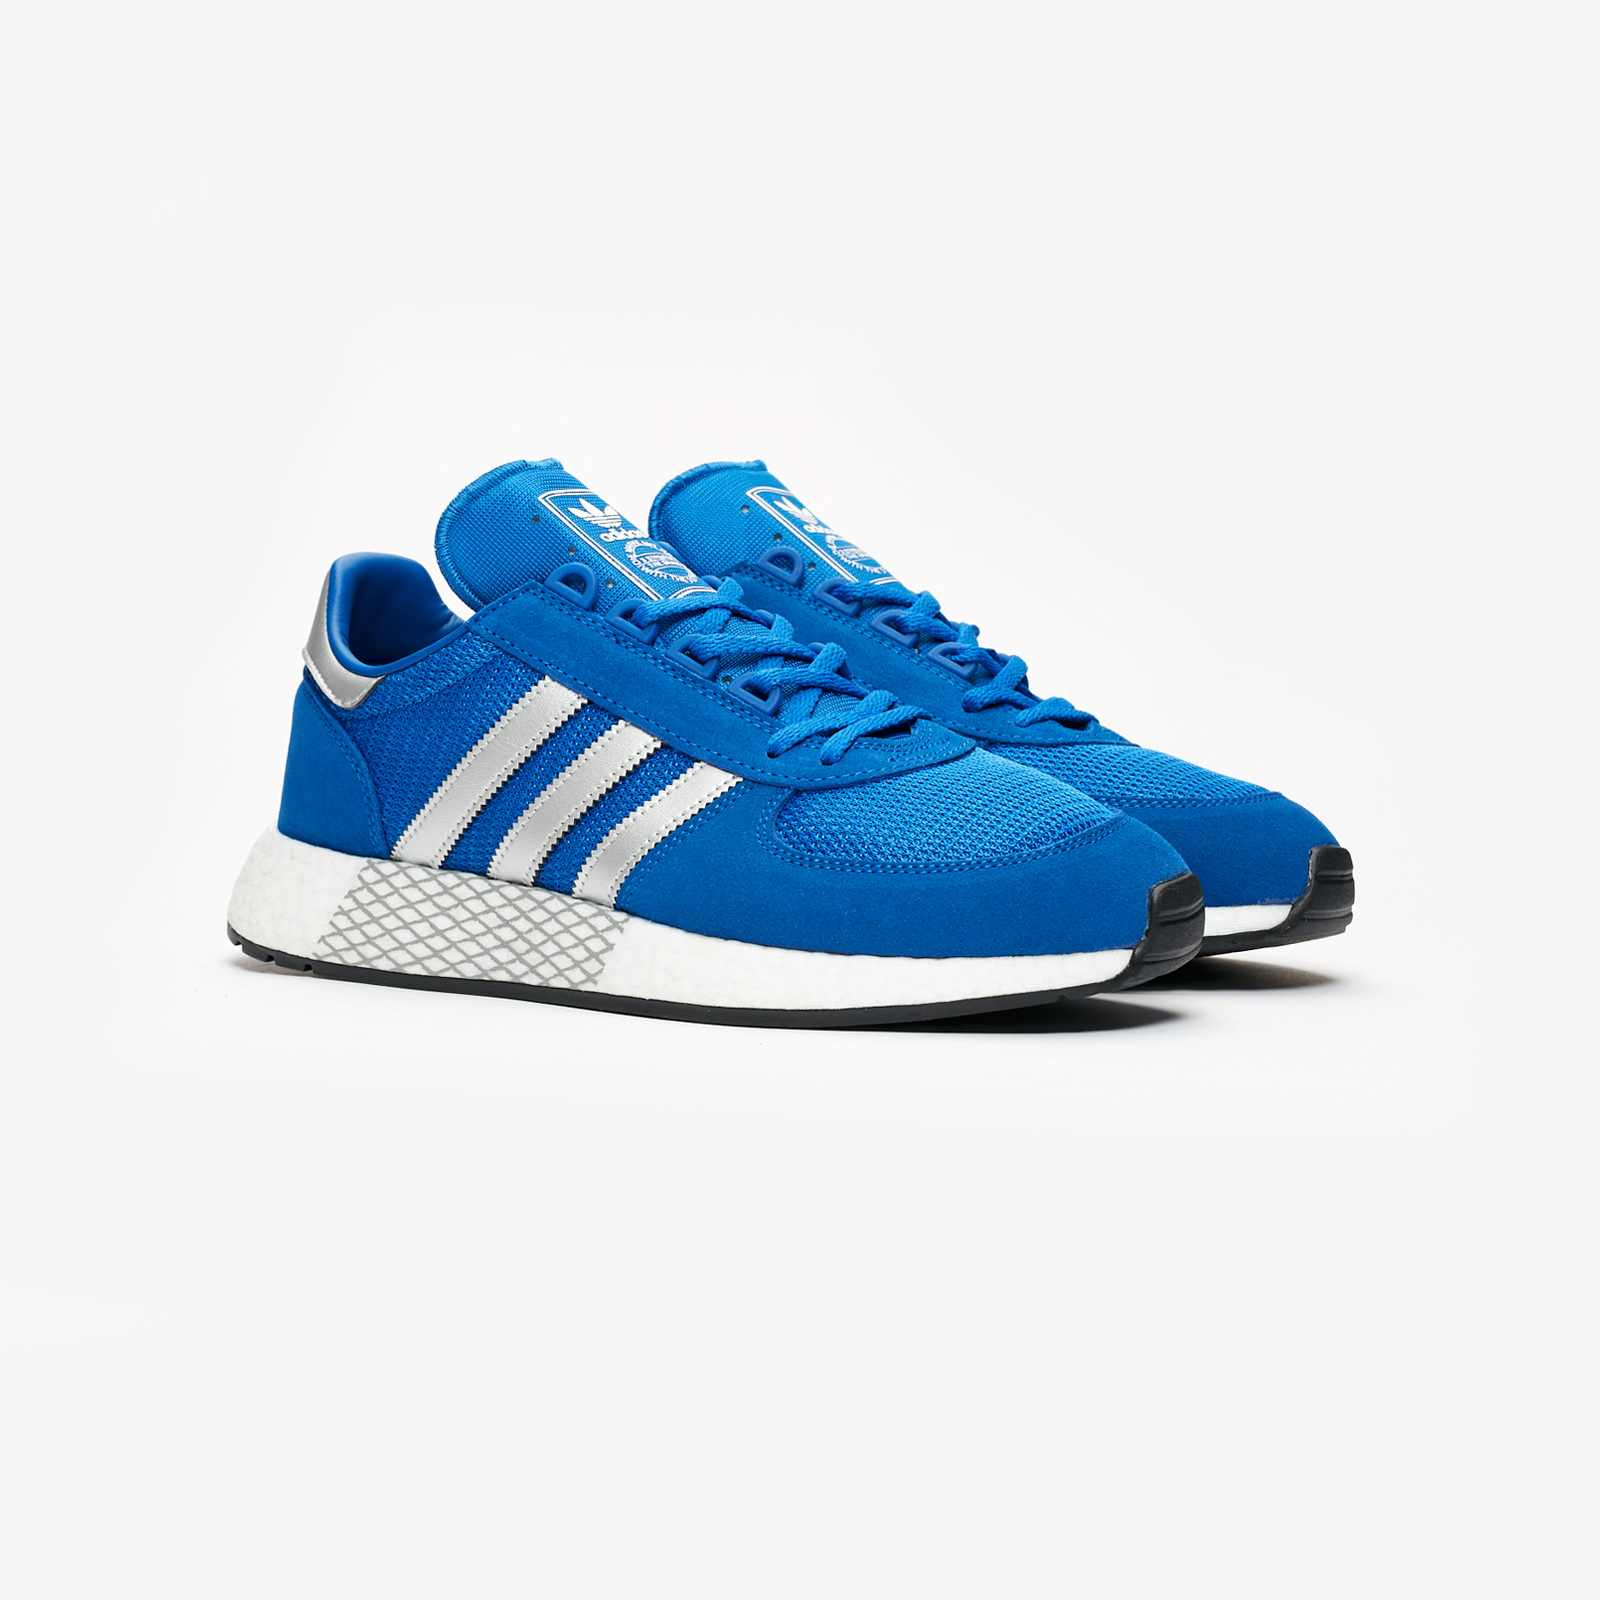 adidas Marathon 5923 Sneaker